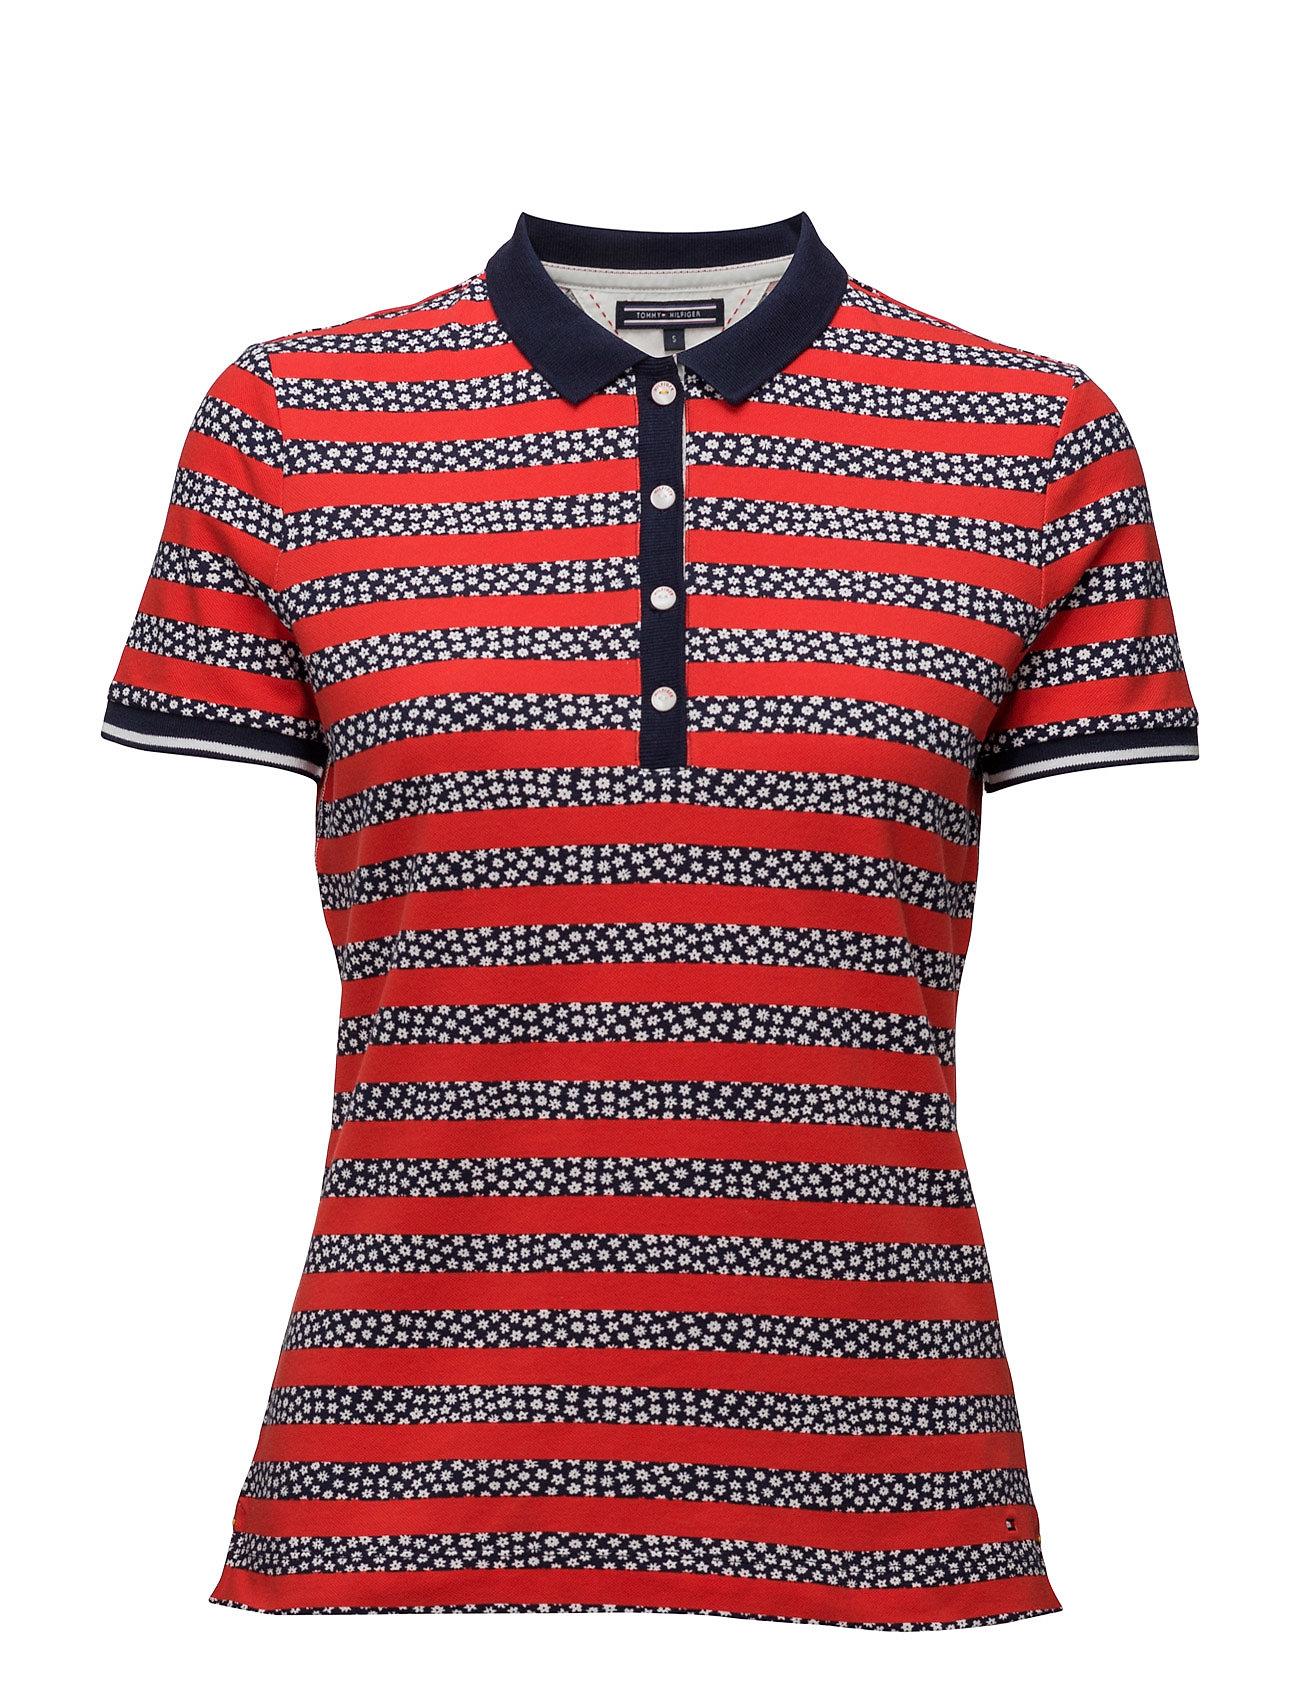 Cordelia Polo Ss Tommy Hilfiger Polo t-shirts til Damer i Blå